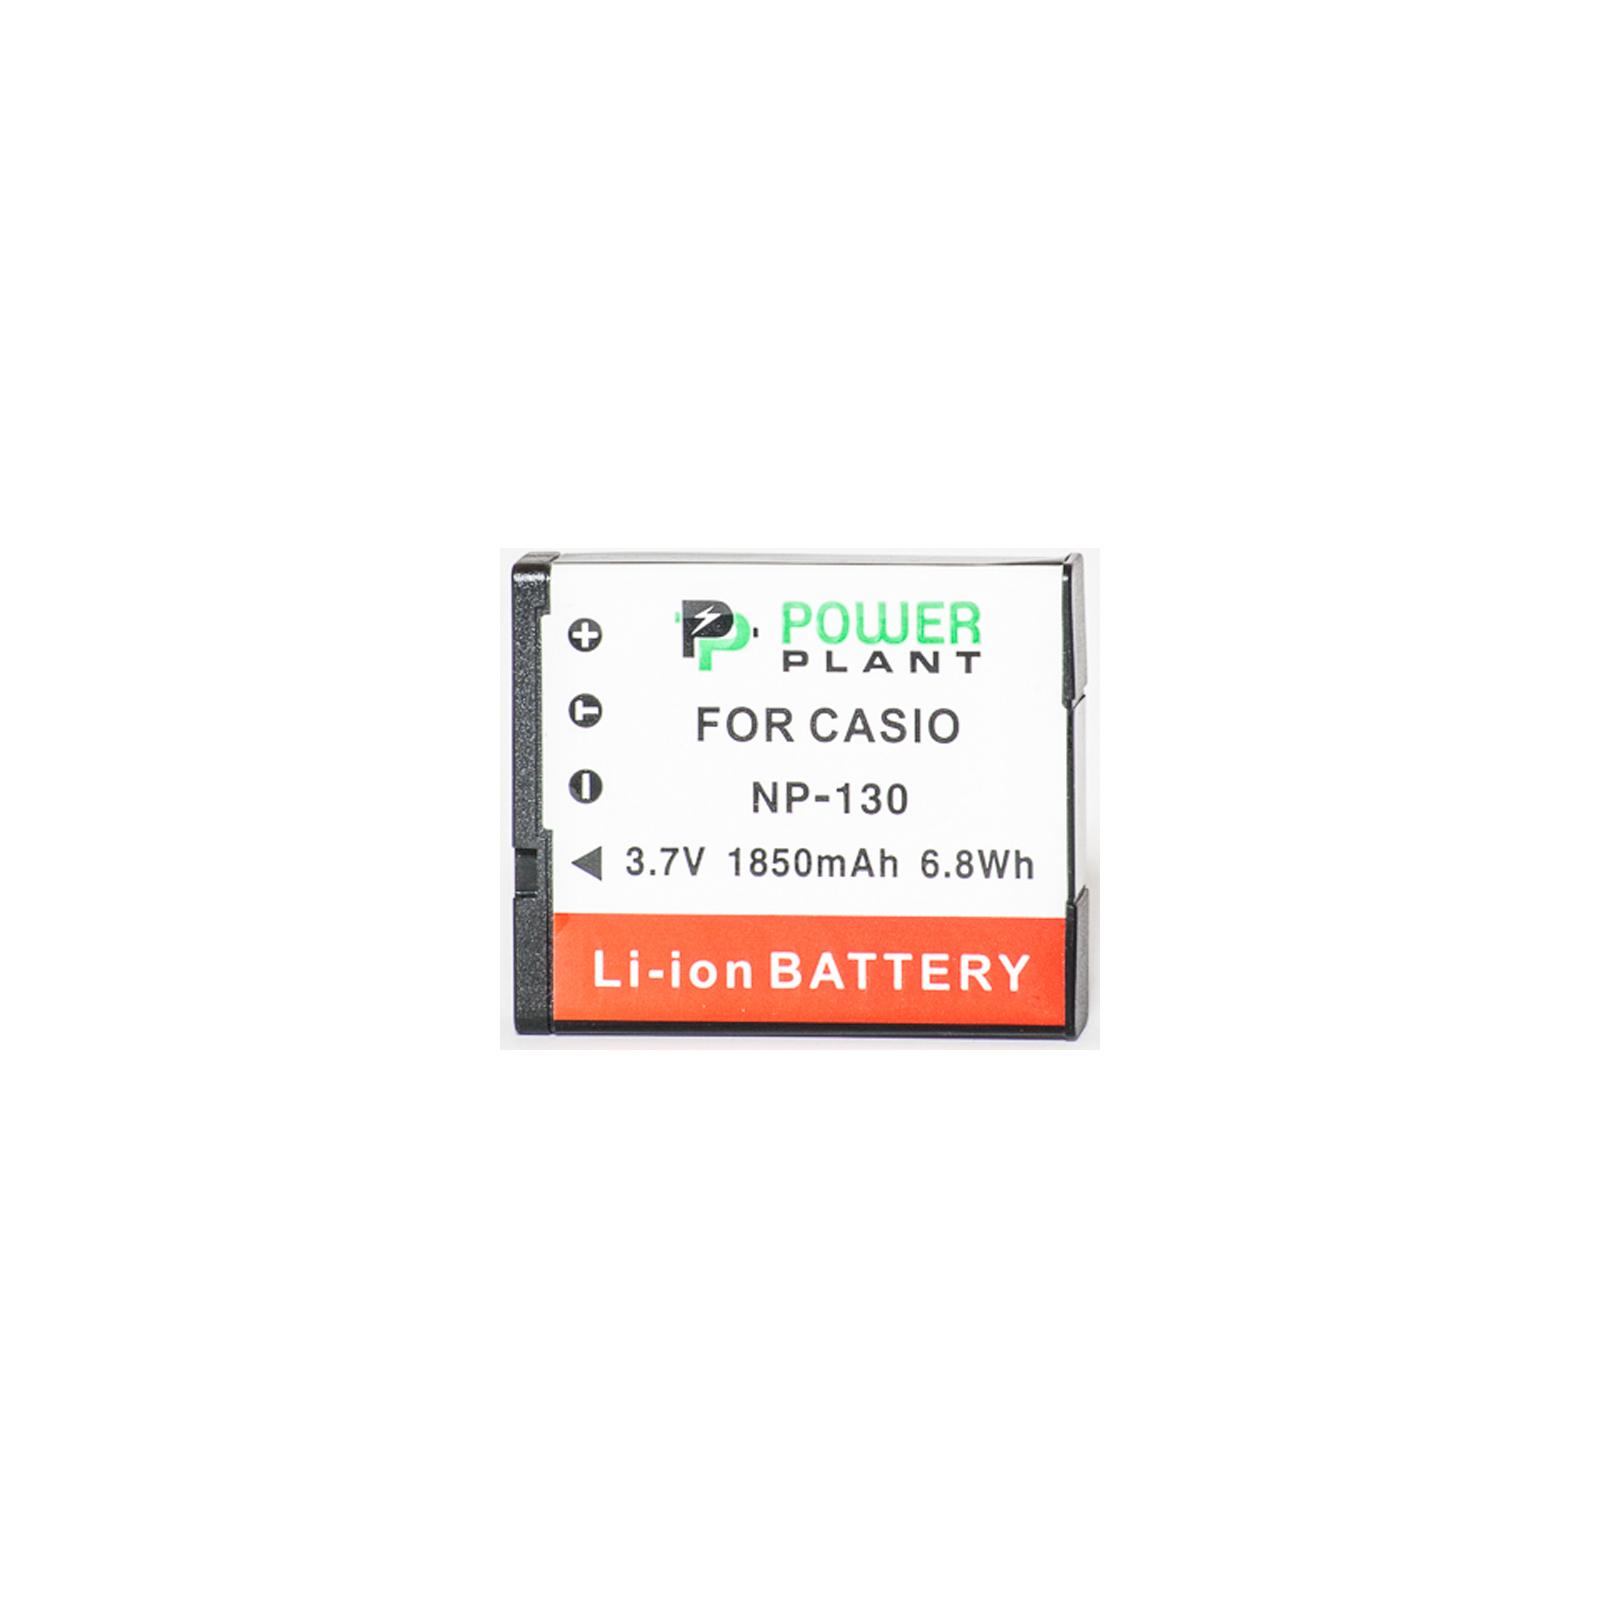 Аккумулятор к фото/видео PowerPlant Casio NP-130 (DV00DV1313) изображение 2